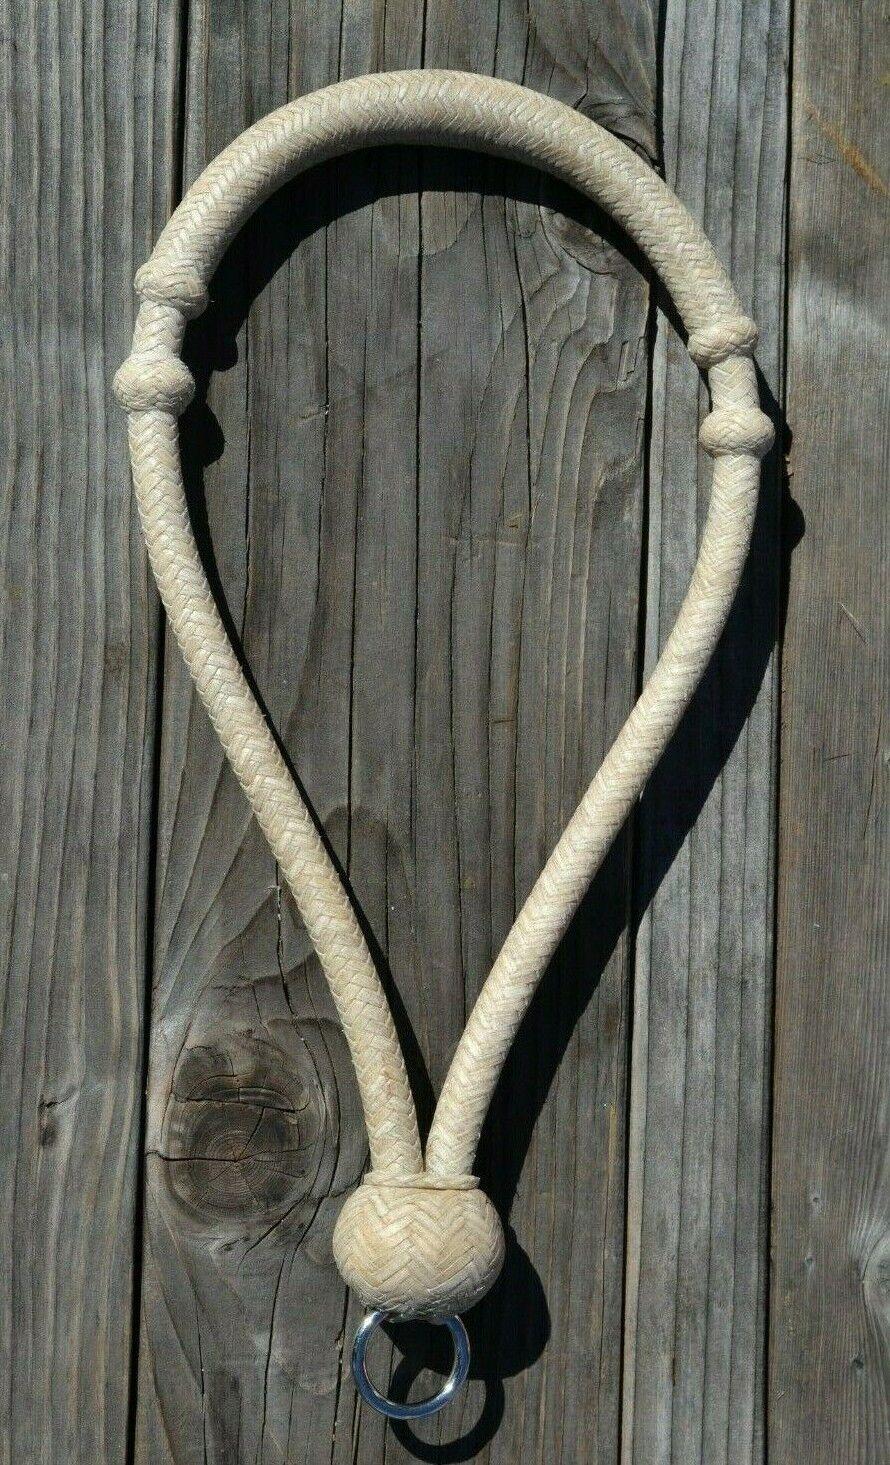 Jose Ortiz 1.3cm Todo Natural Cuero sin Curtir BOSAL - rojoondo Knot con Anillo -